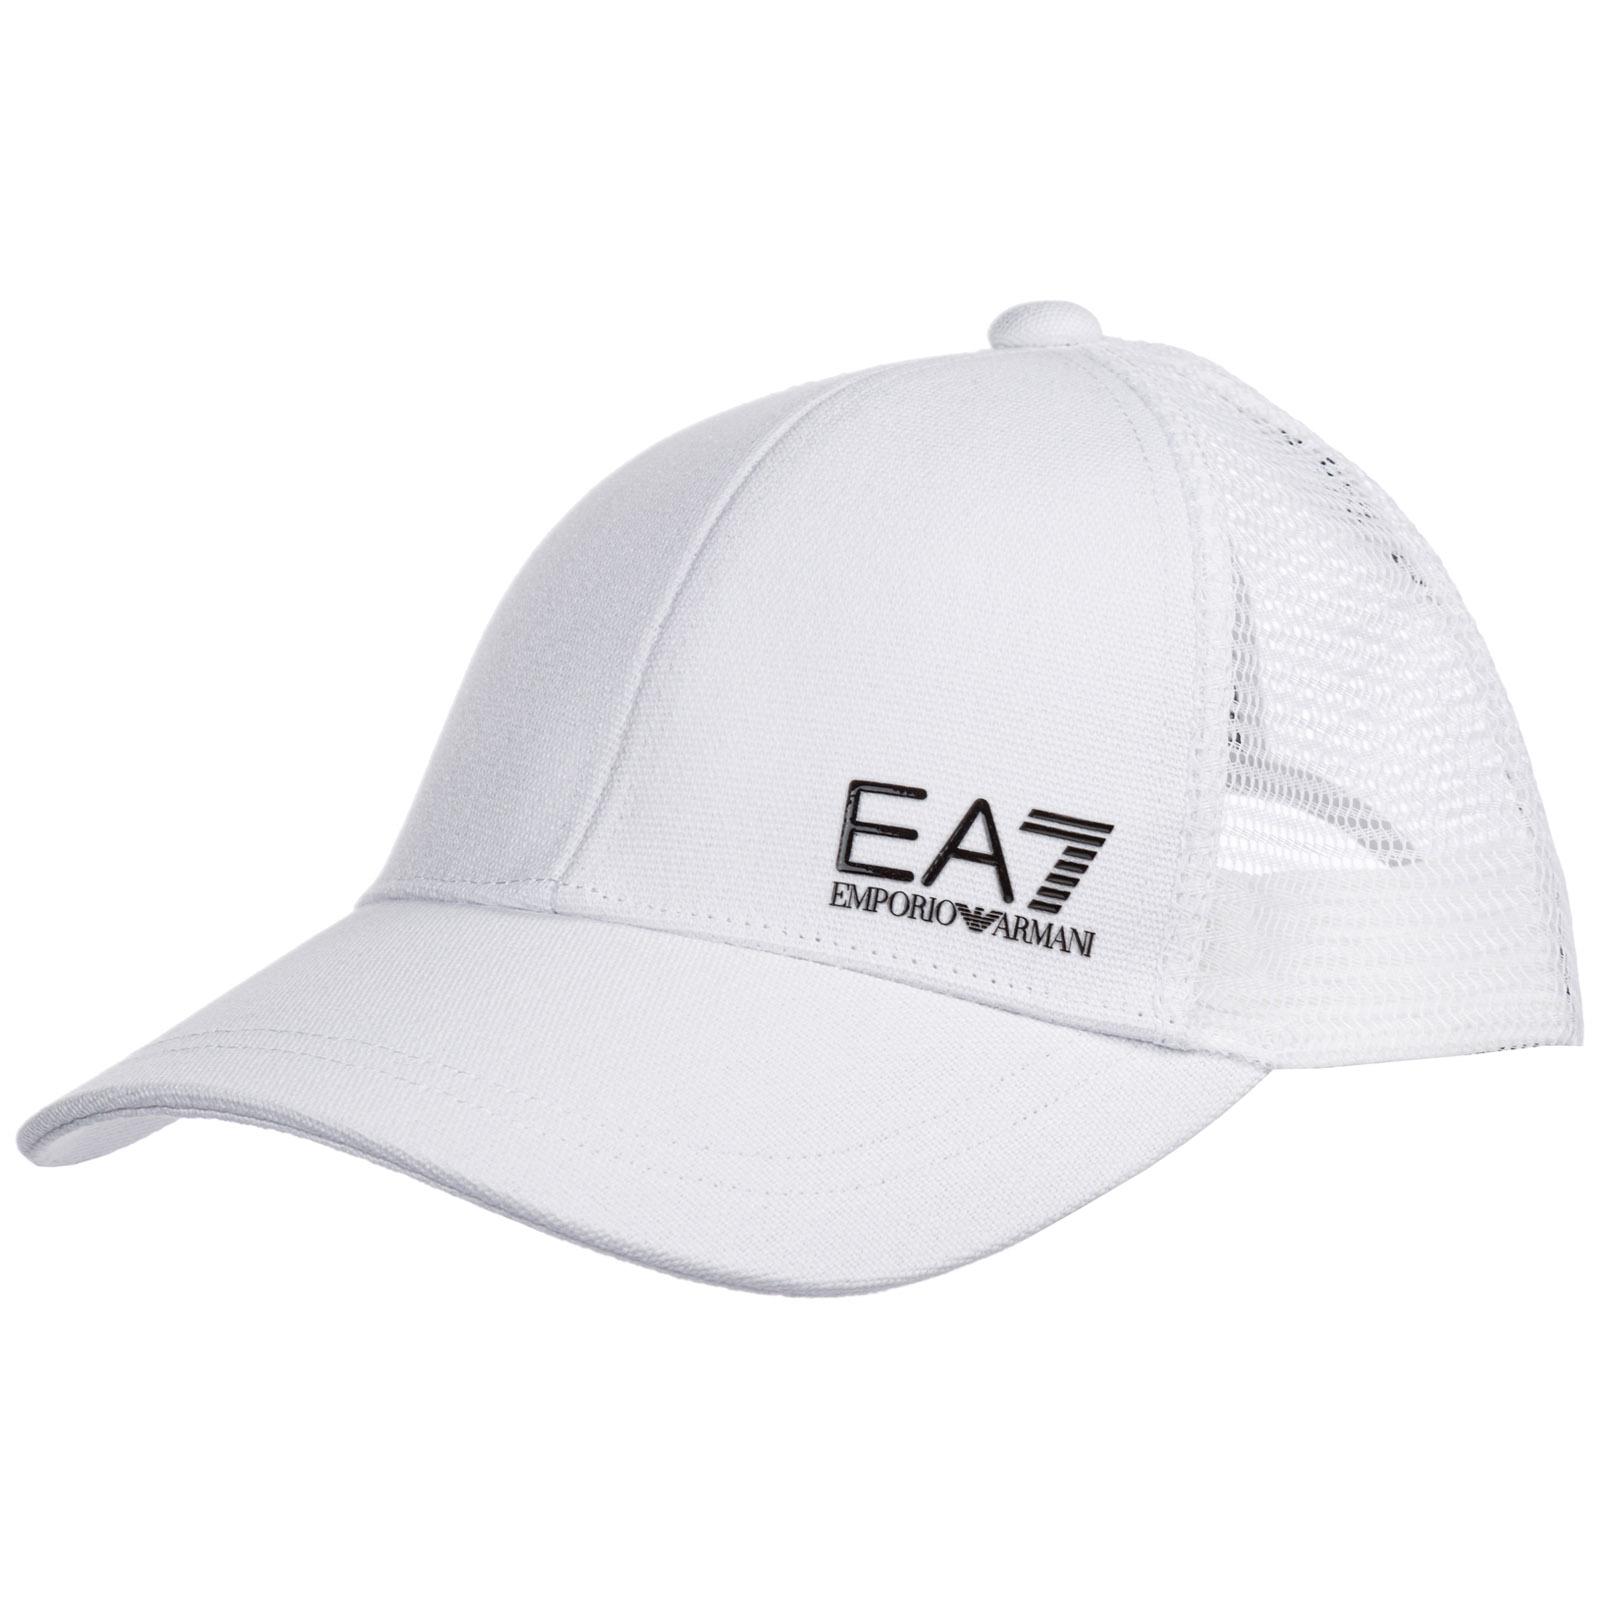 154ea52951 Adjustable men's cotton hat baseball cap